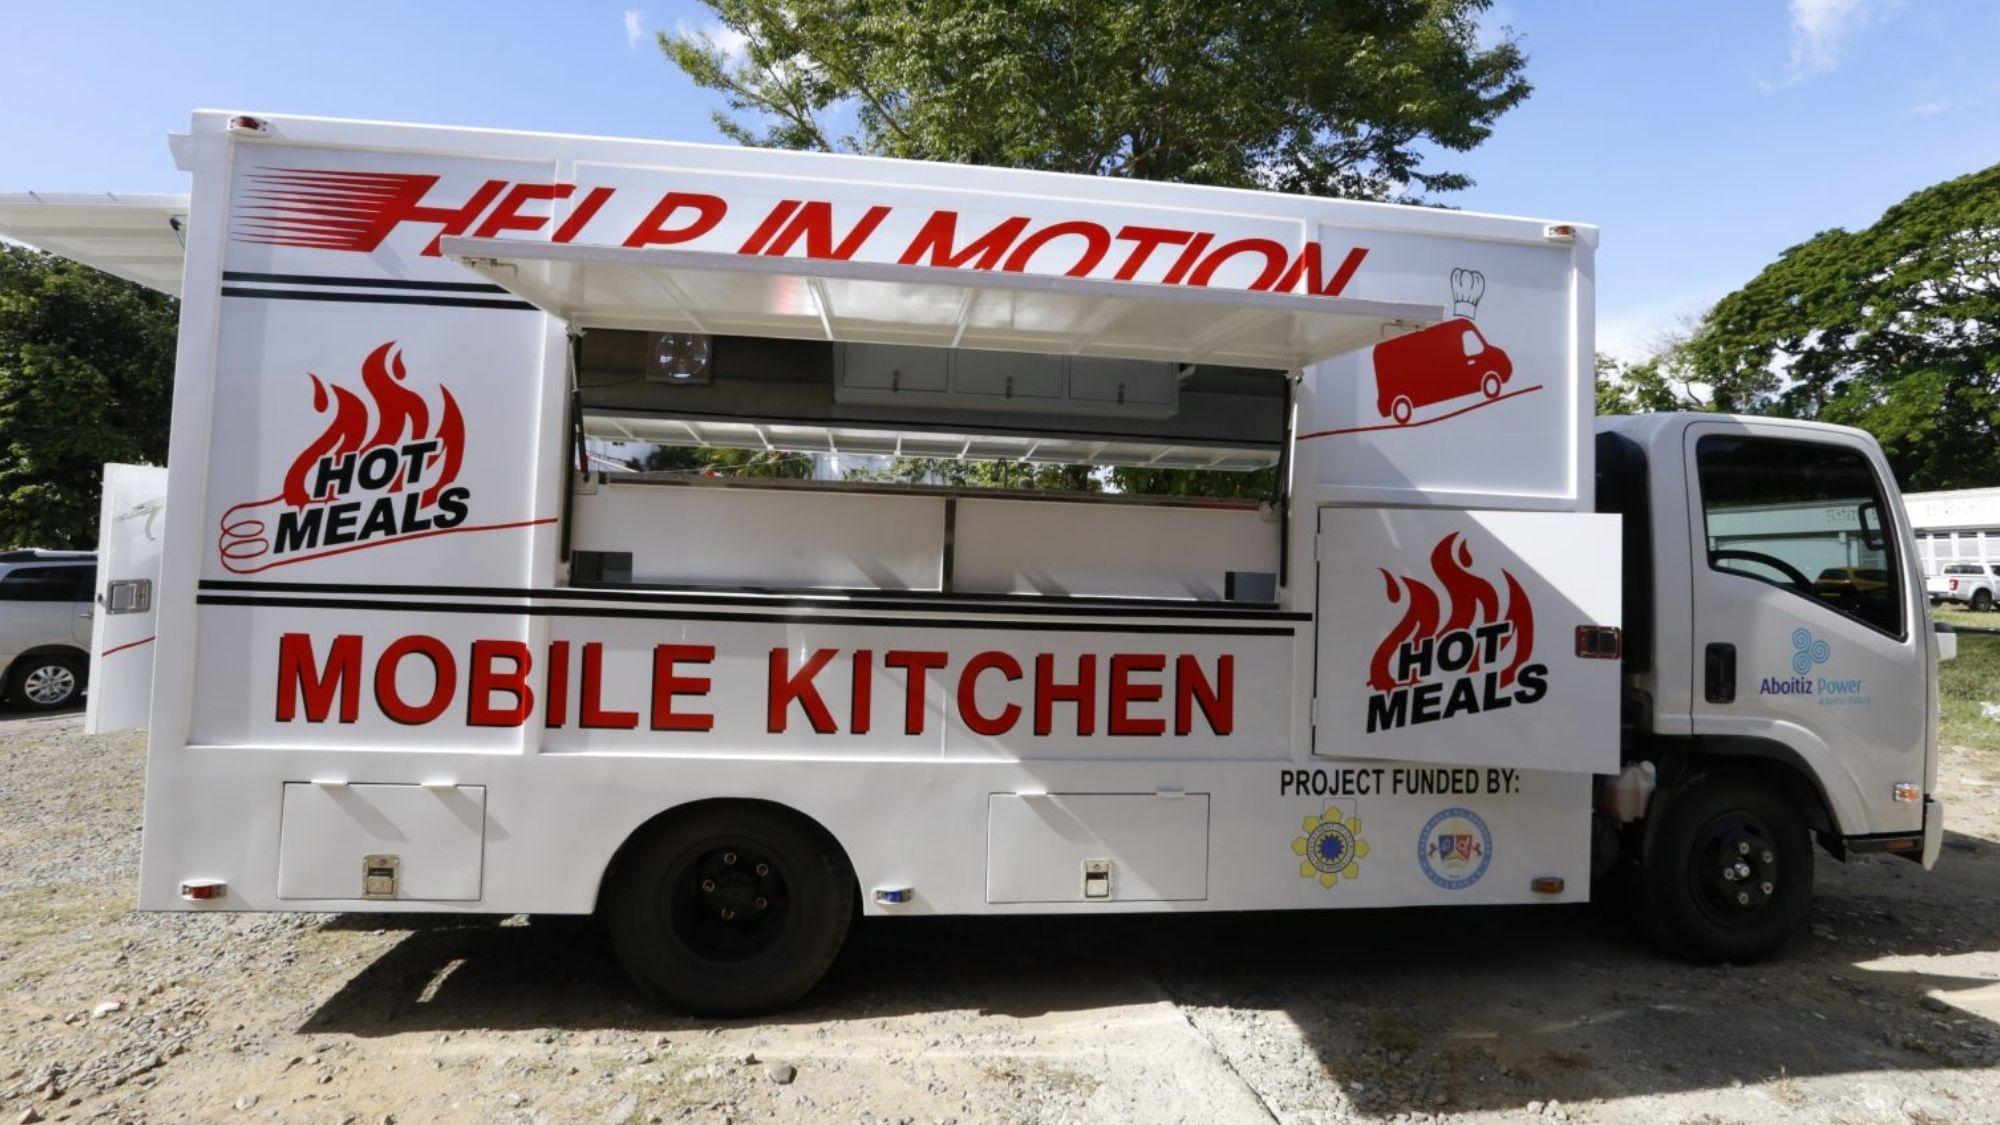 Mobile community kitchen, inilunsad sa Batangas